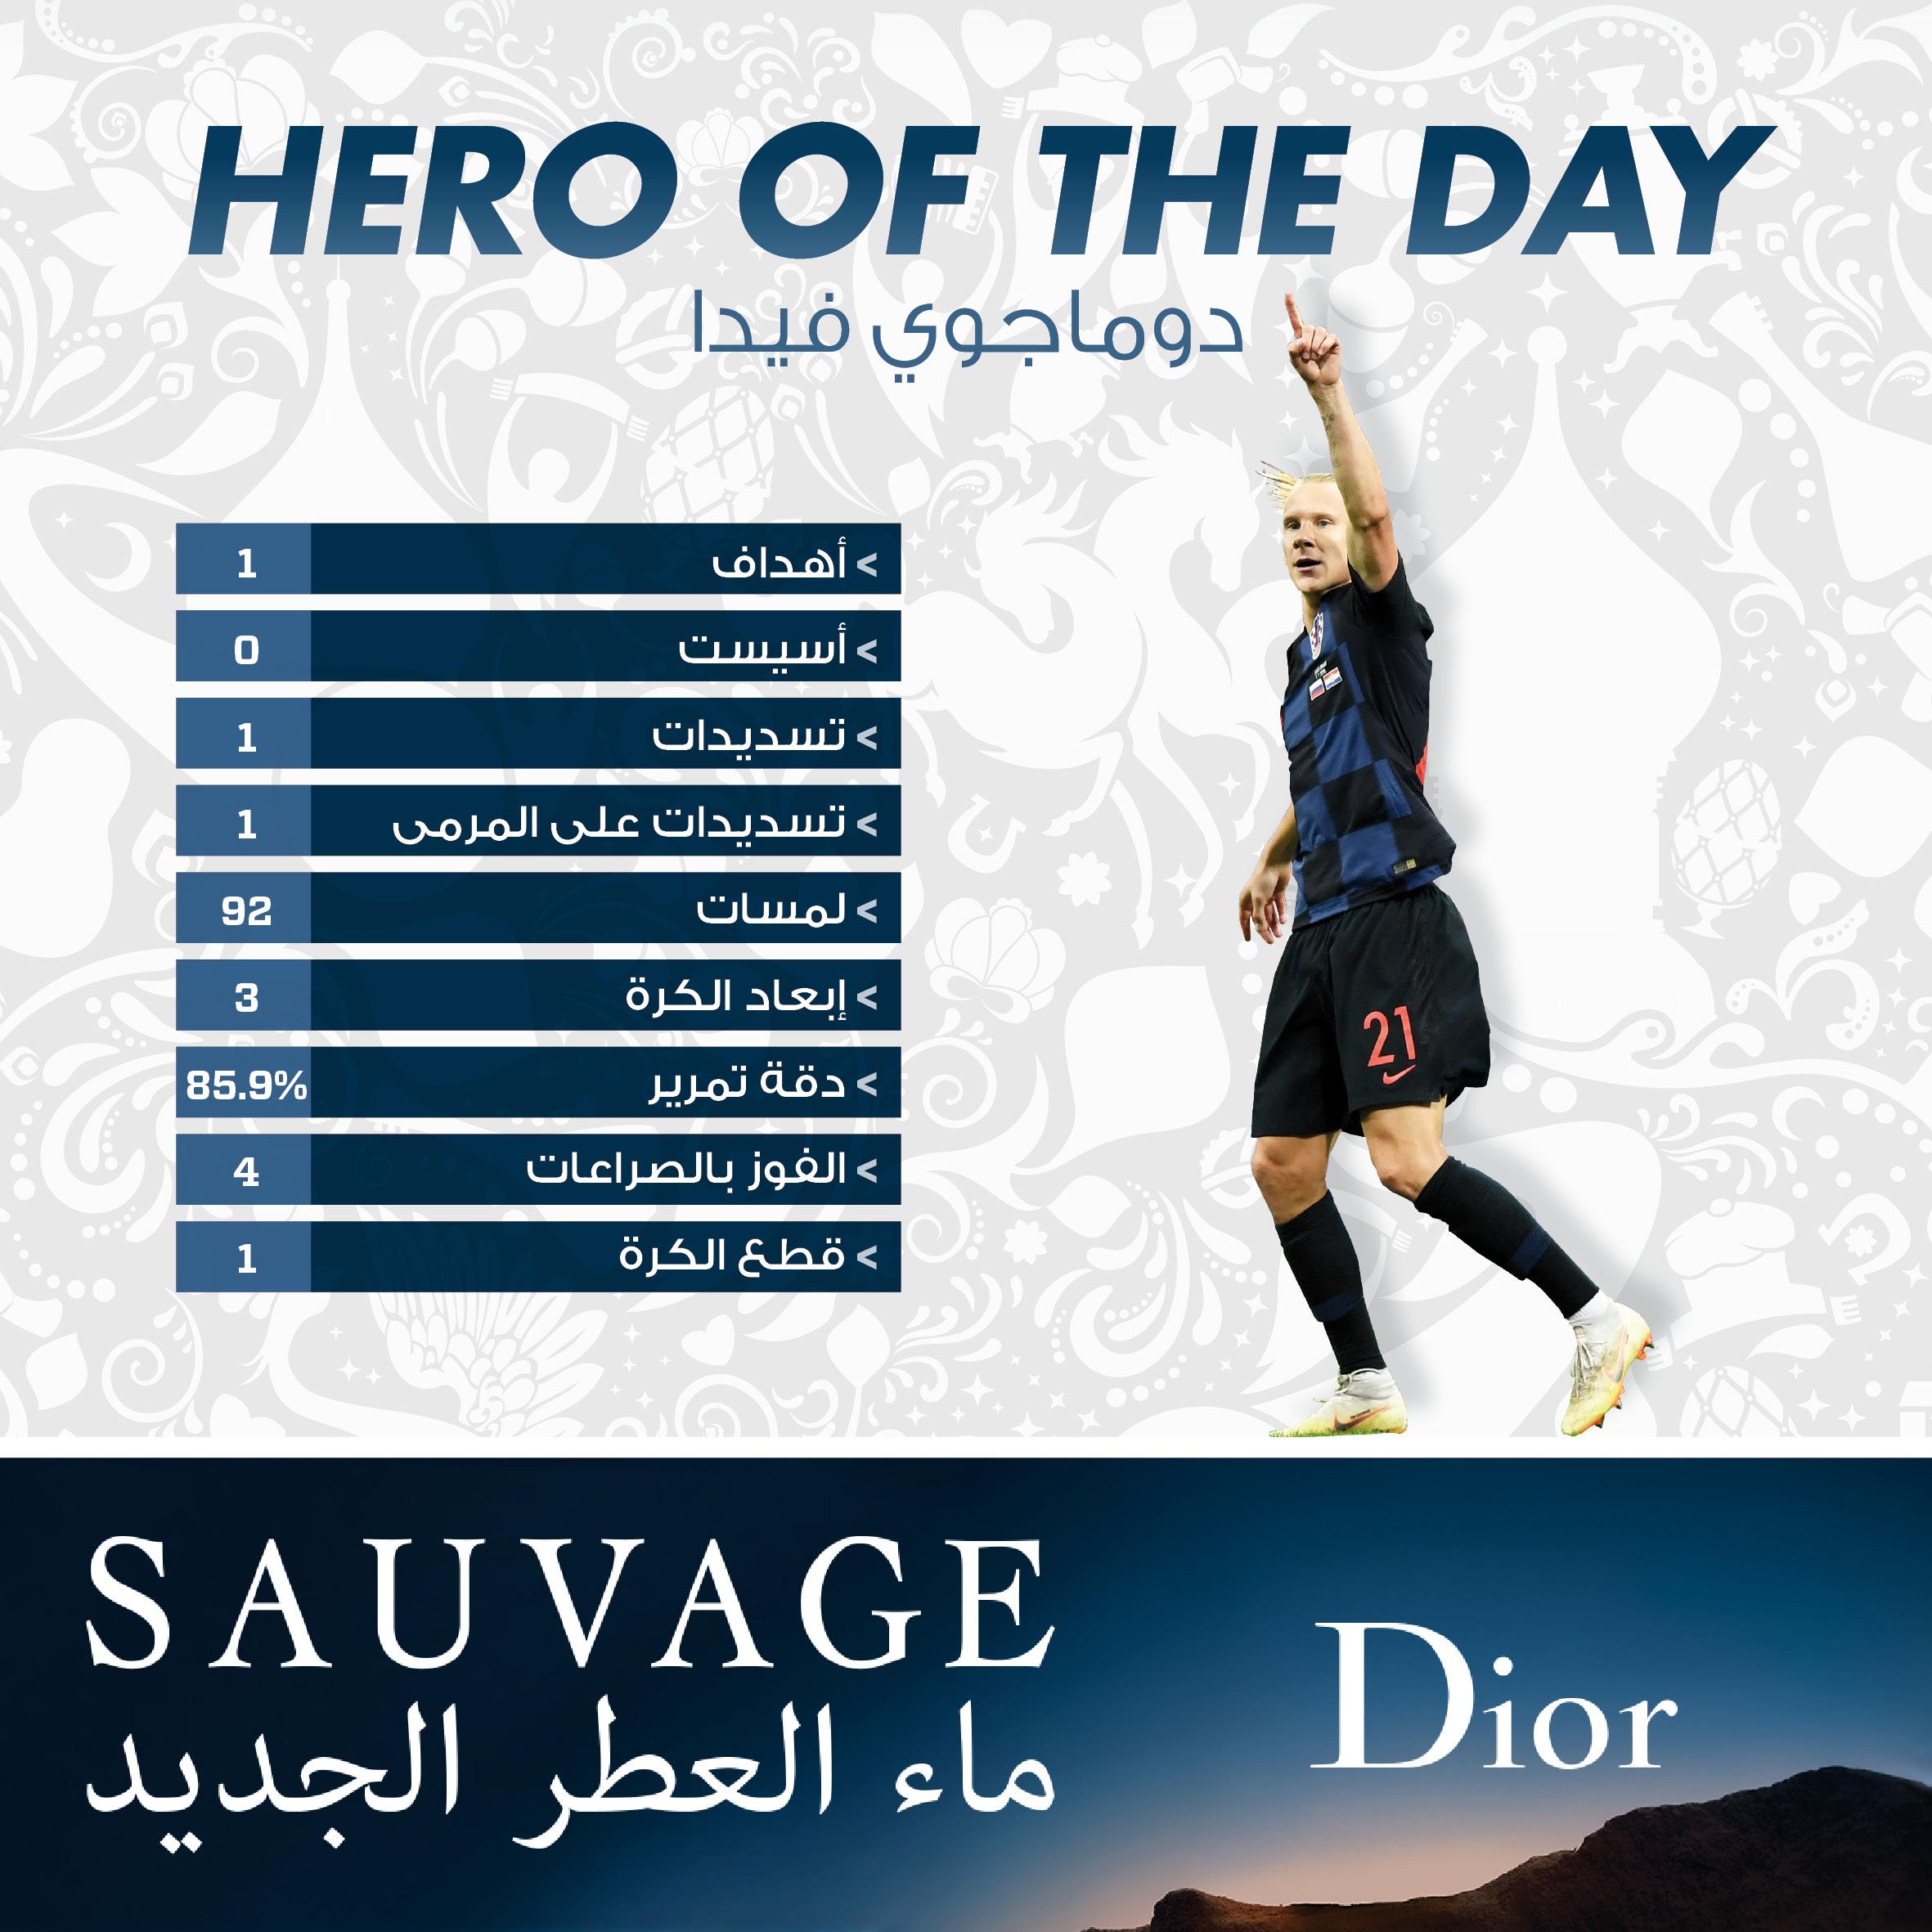 08 07 hero of day Domagoj vida Arabic